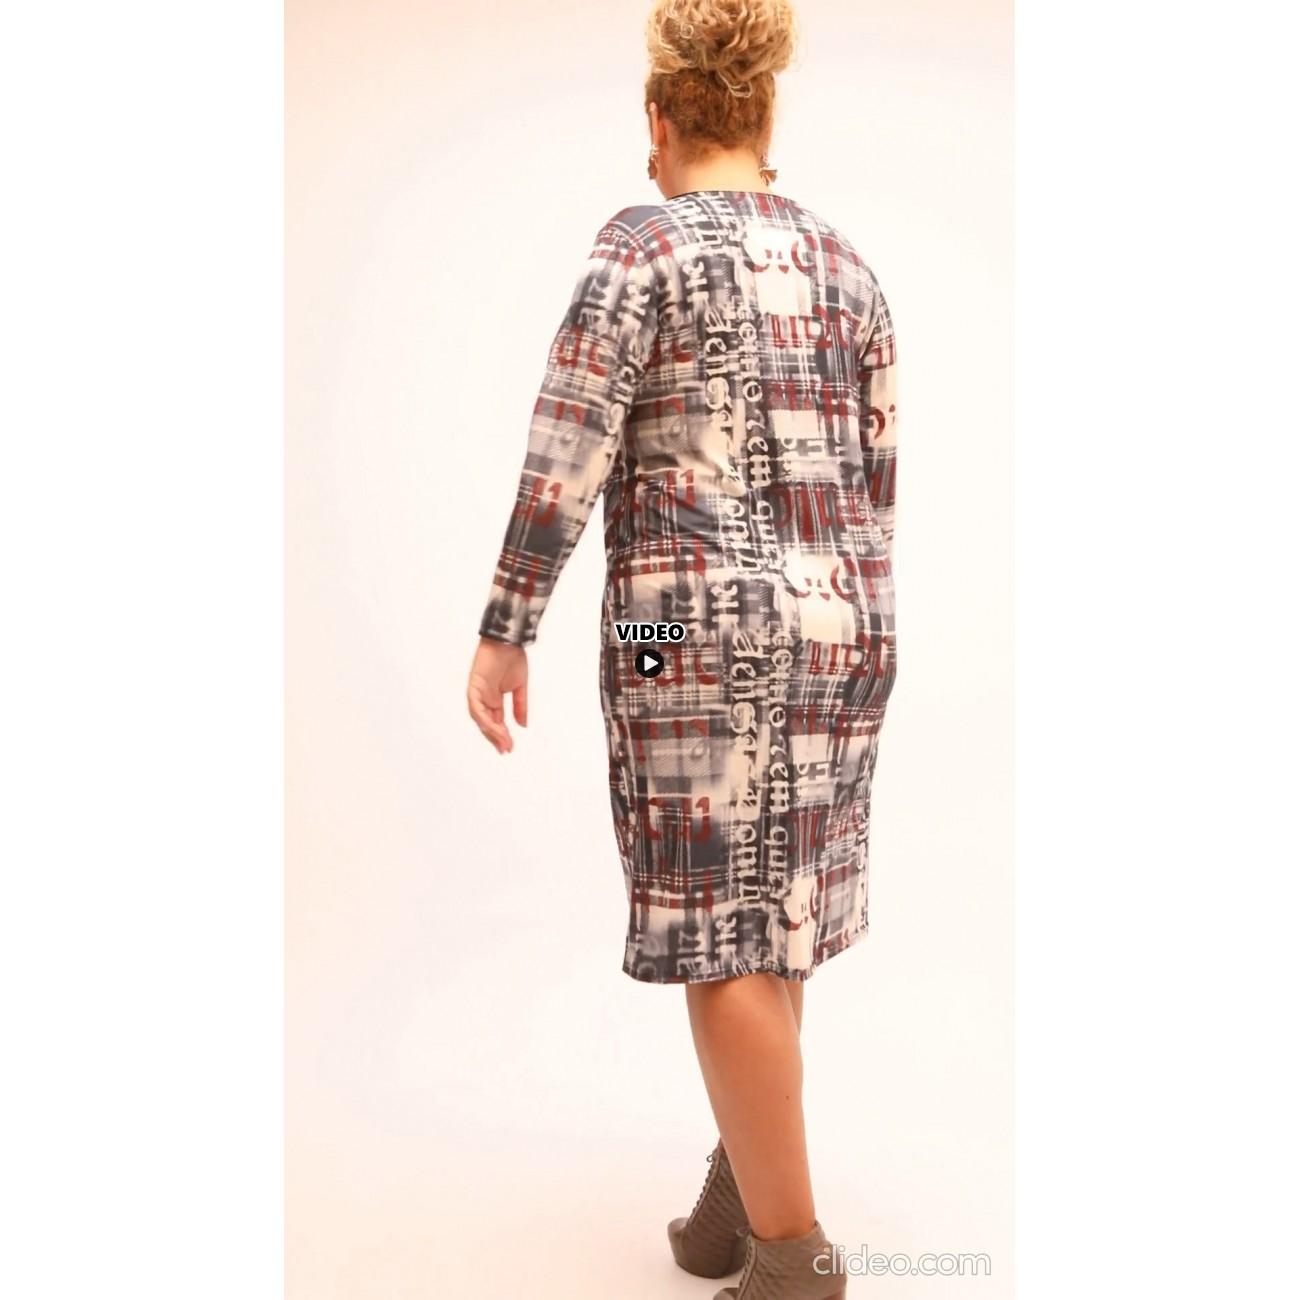 B21-1000V Classic dress with pattern